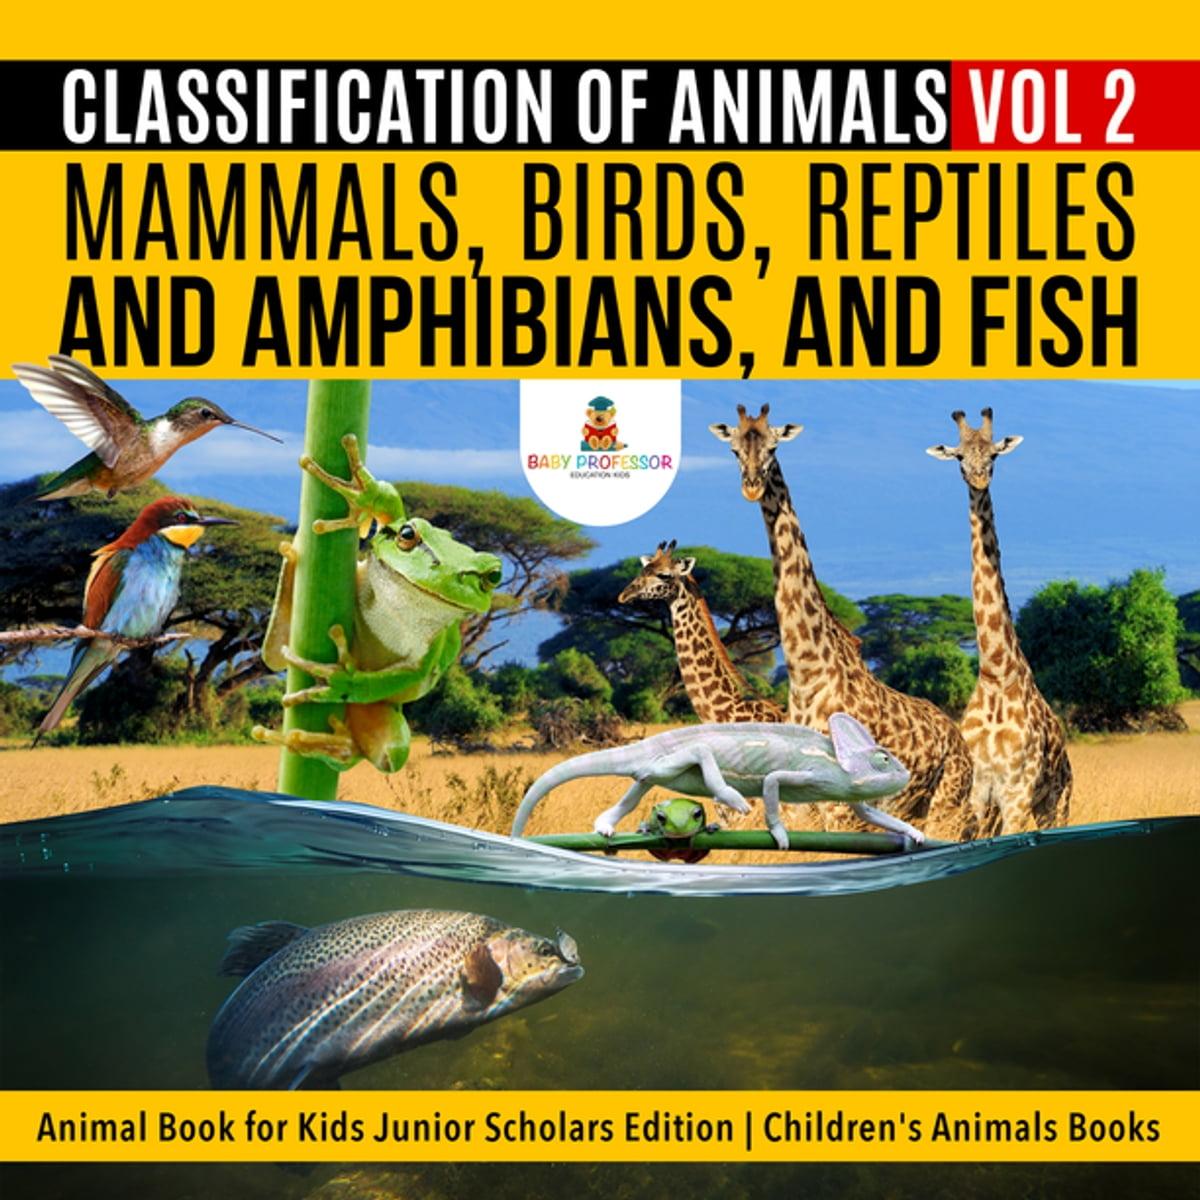 Classification Of Animals Vol 2 Mammals Birds Reptiles